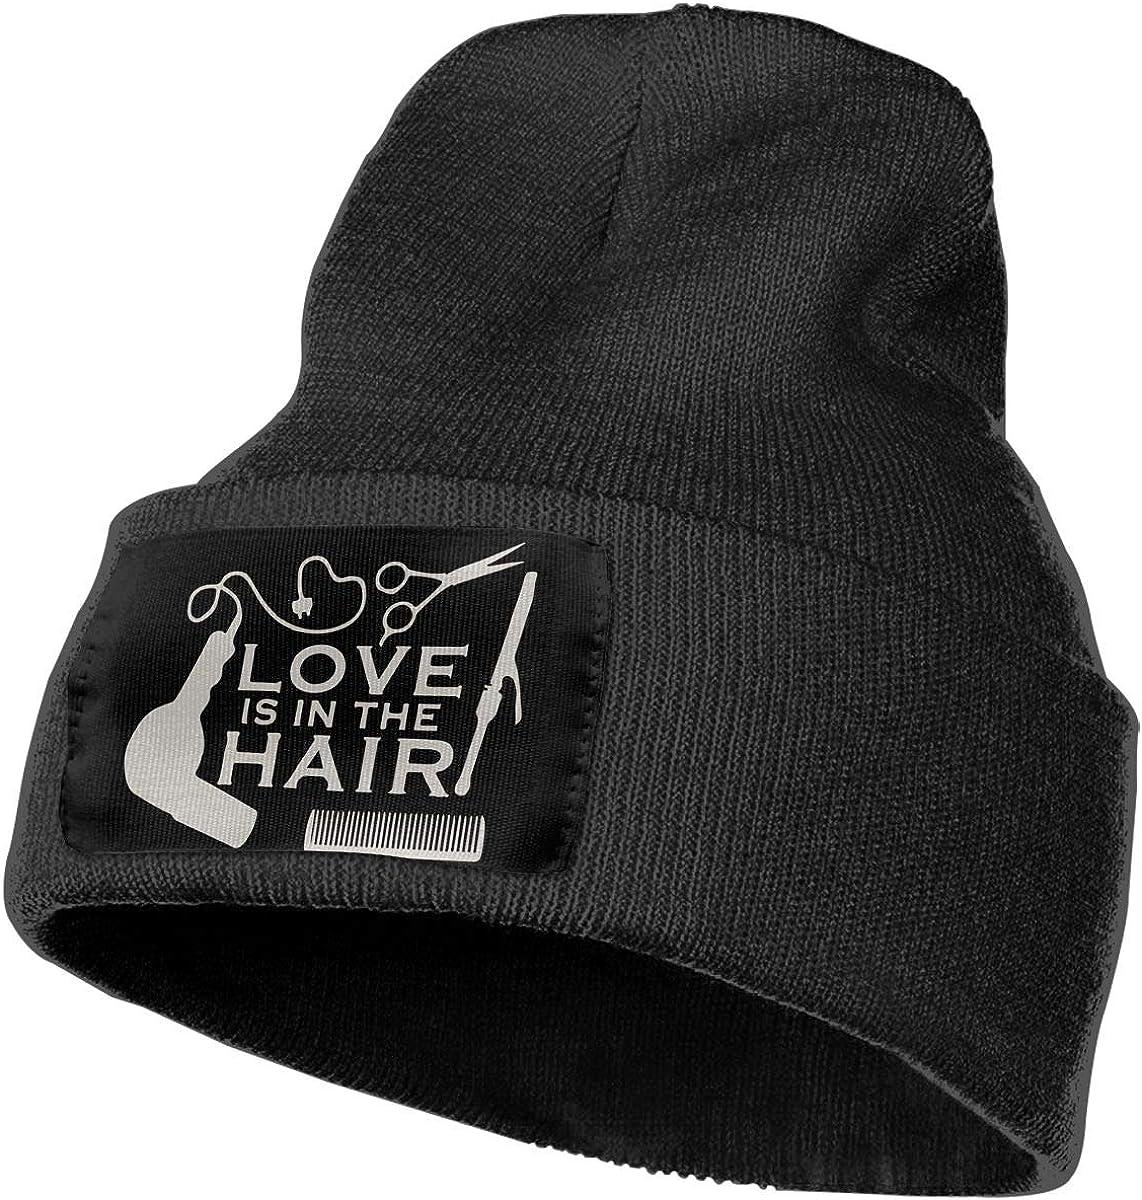 Unisex Barber Salon Hairdresser Love Outdoor Fashion Knit Beanies Hat Soft Winter Skull Caps